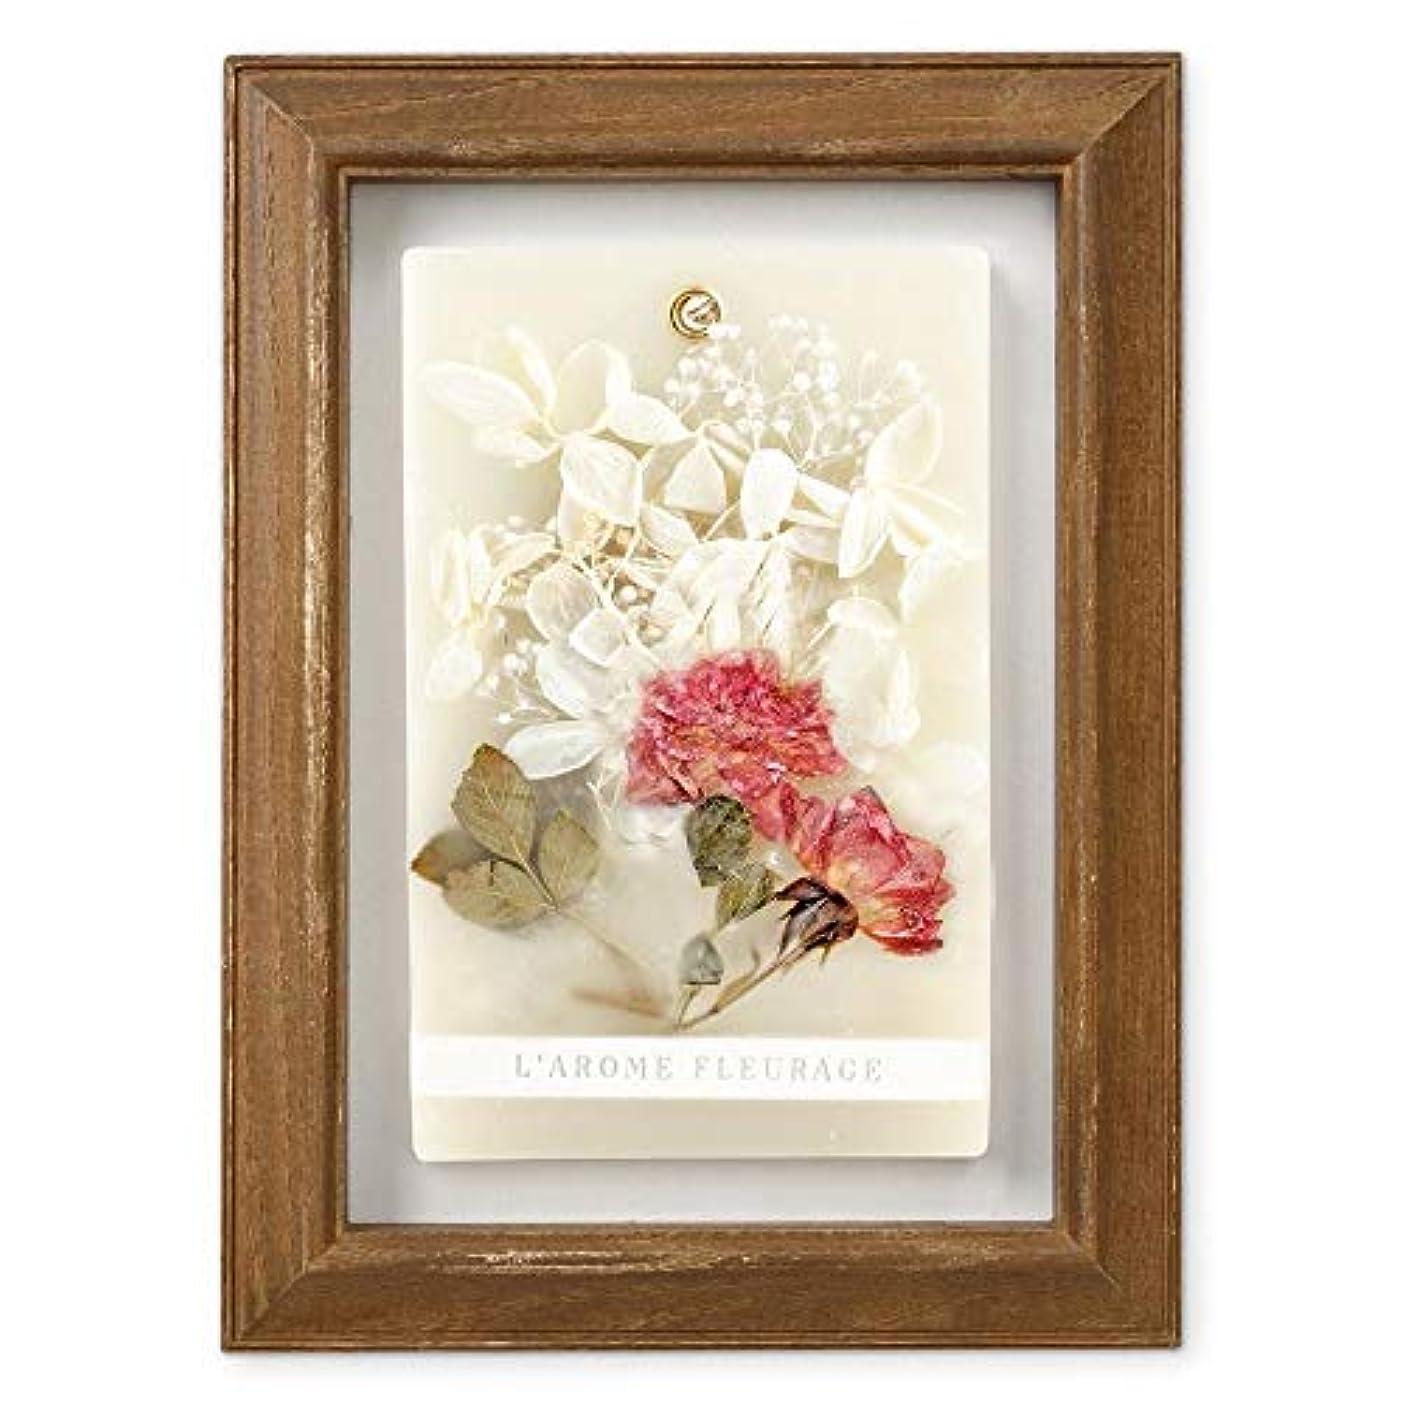 FLEURAGE(フルラージュ) アロマワックスサシェ ワイルドローズの香り Rose×AntiqueBrown KH-61122